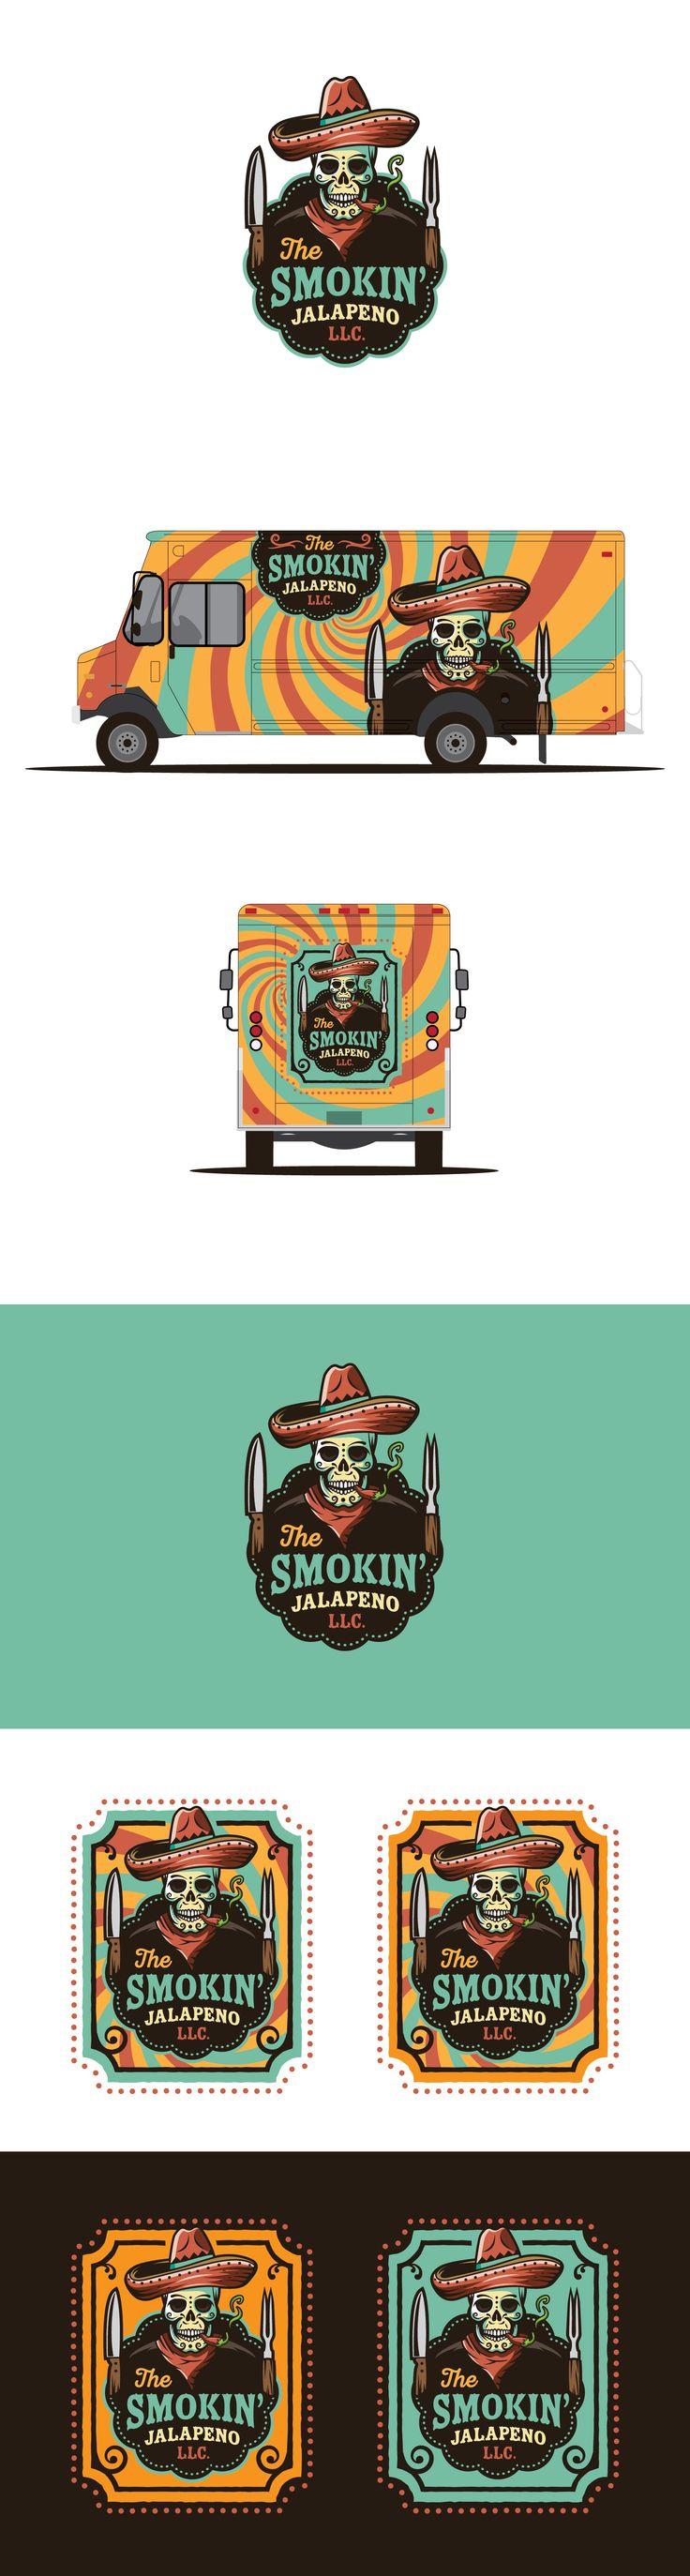 84 food truck logo ideas ideas design by turner for Best food truck designs